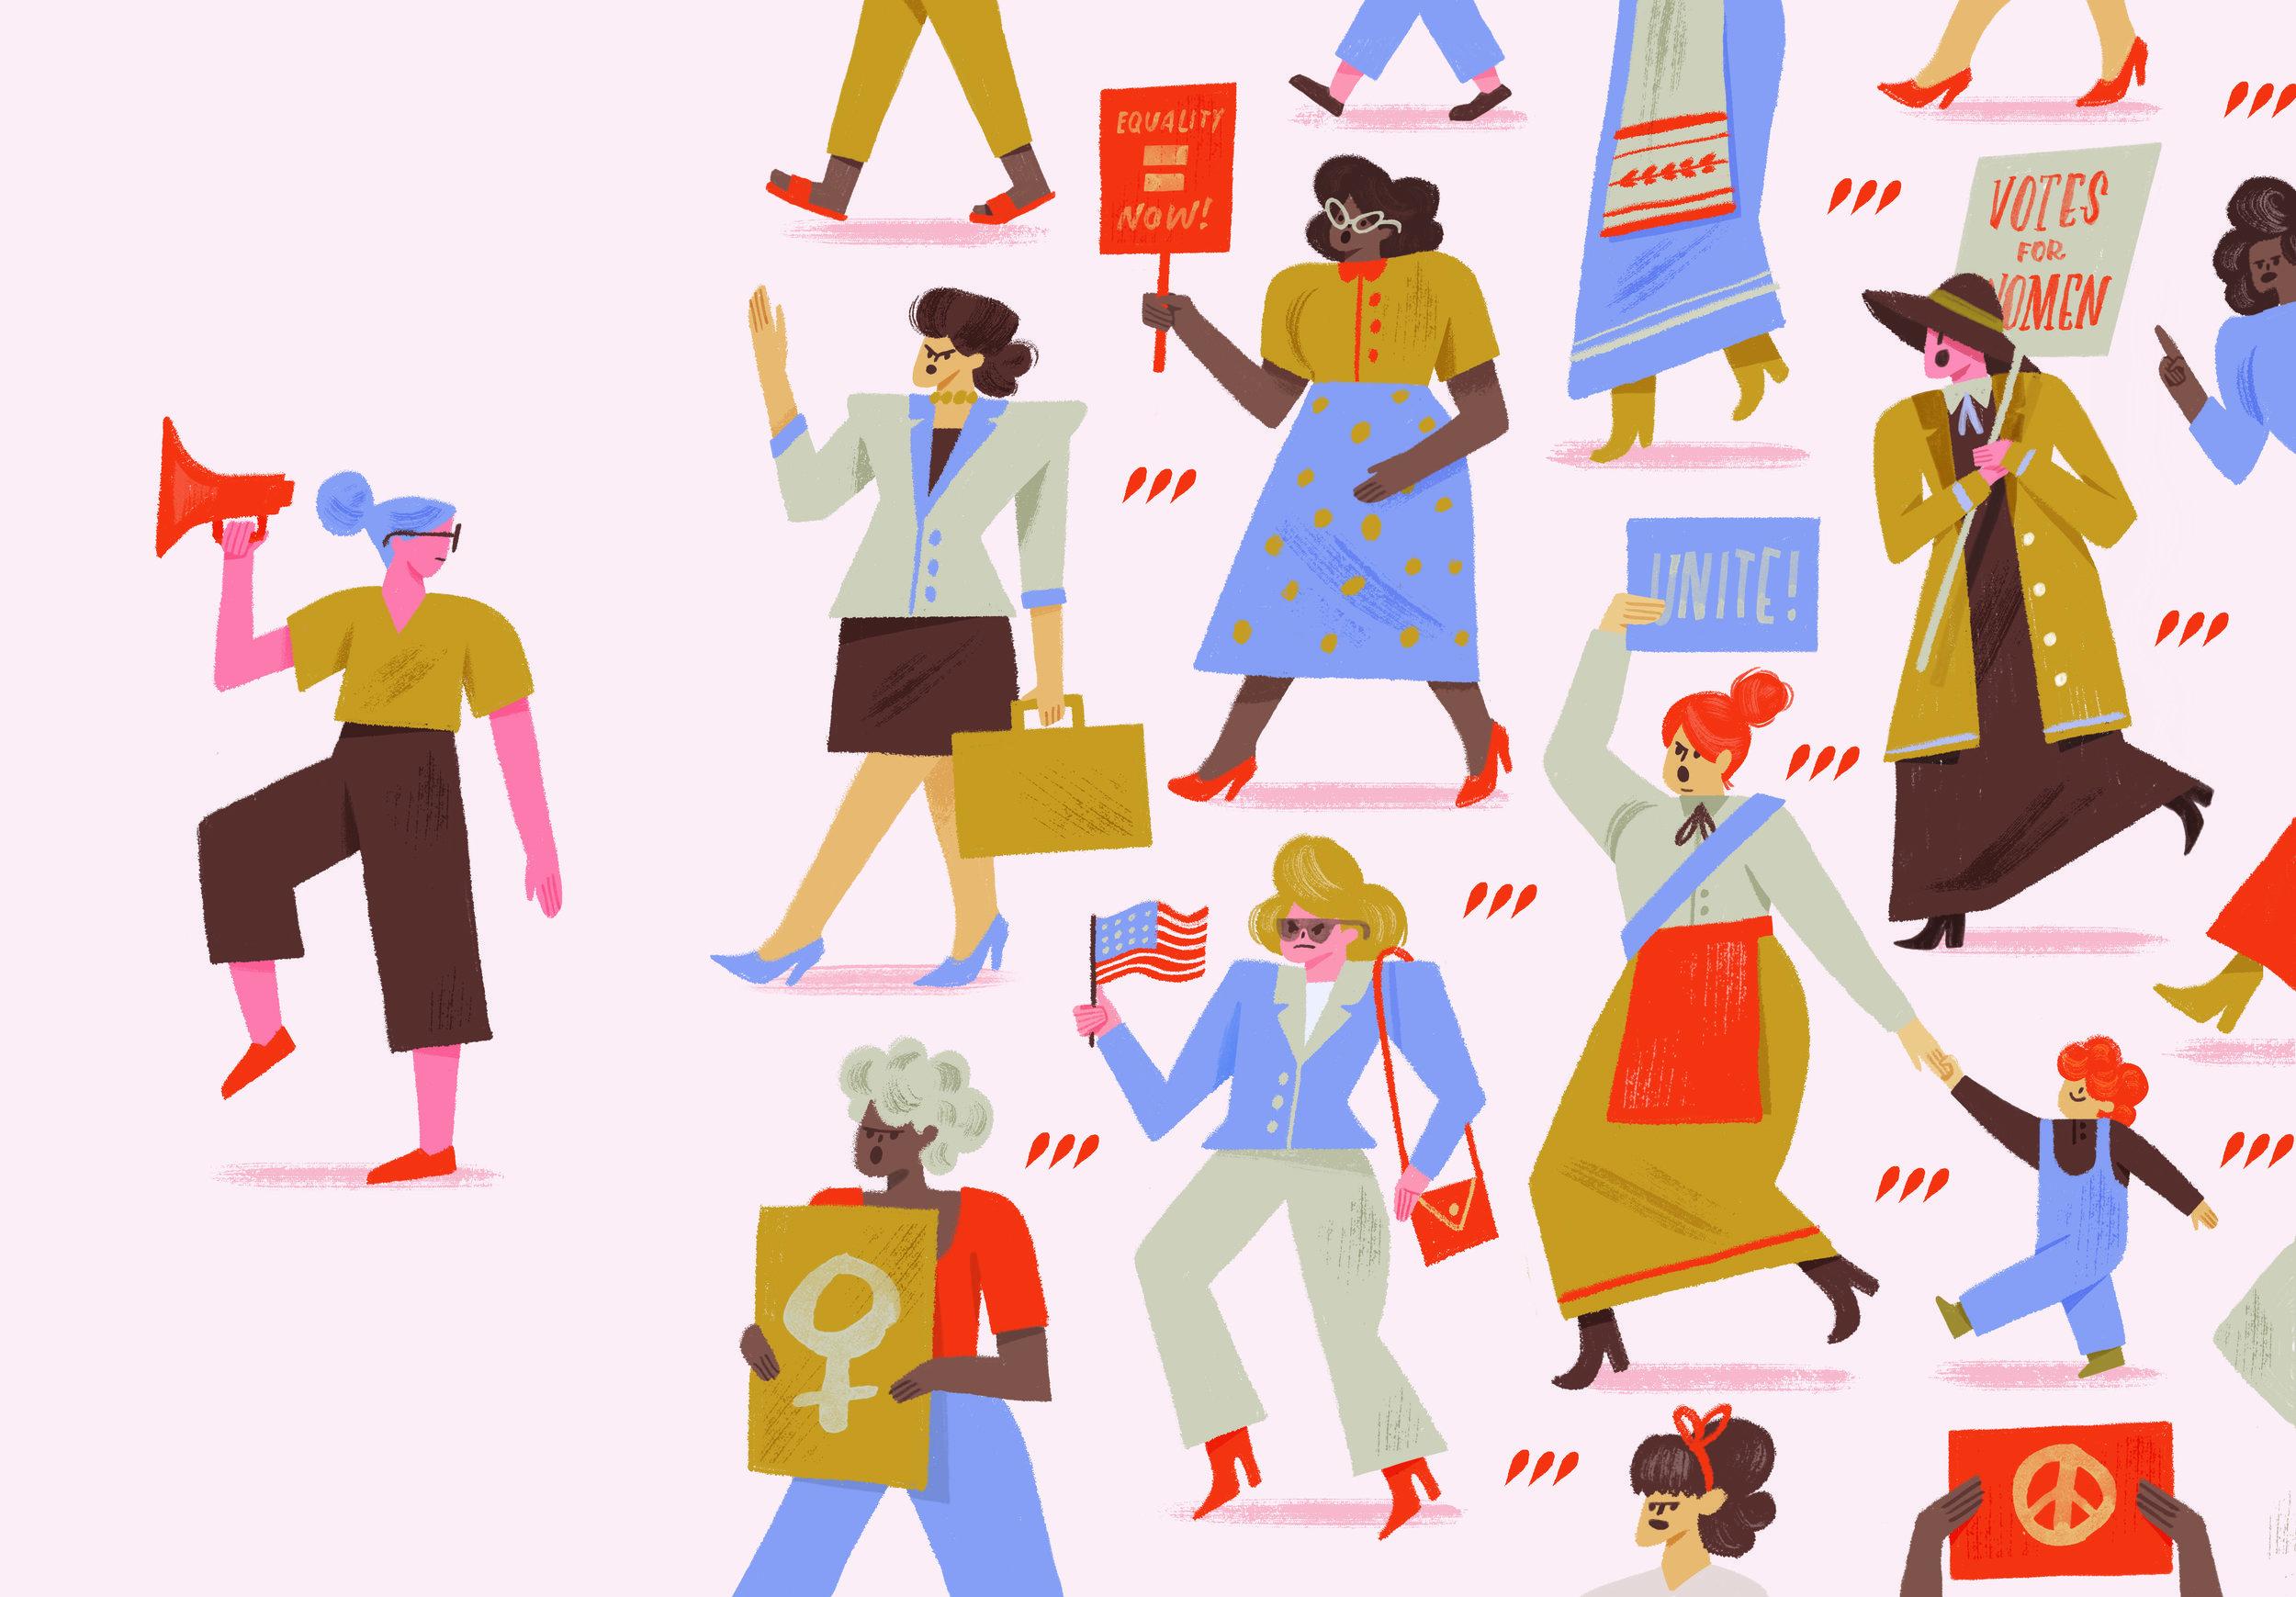 OMNIA_Women'sPolitics_Color.jpg